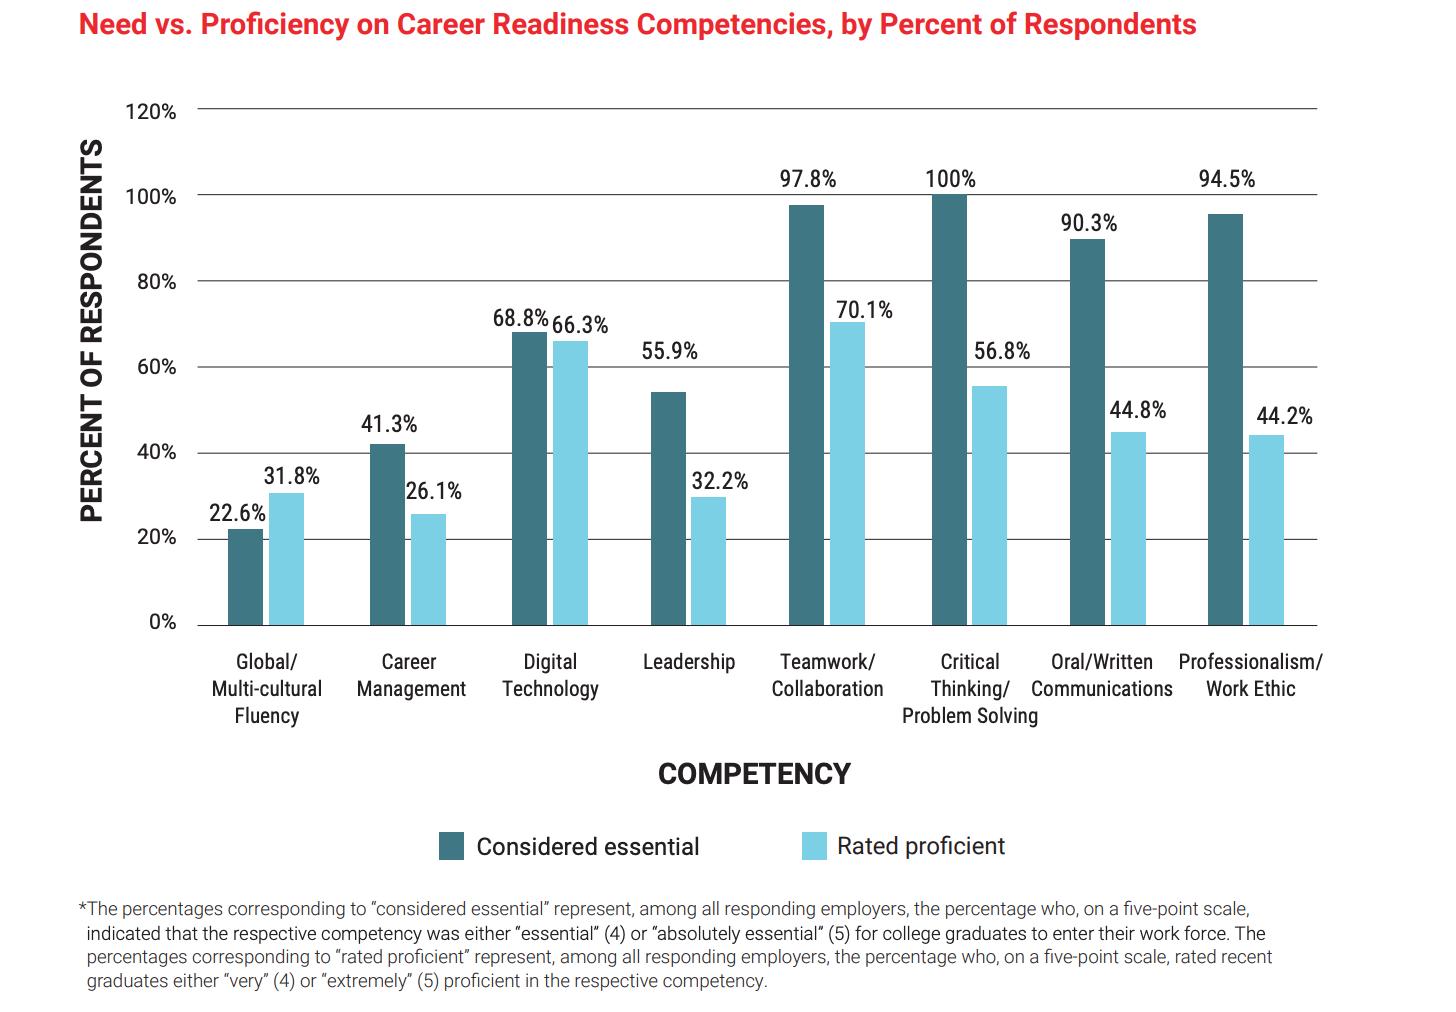 Screen Capture of Need vs. Proficiency on Career Readiness